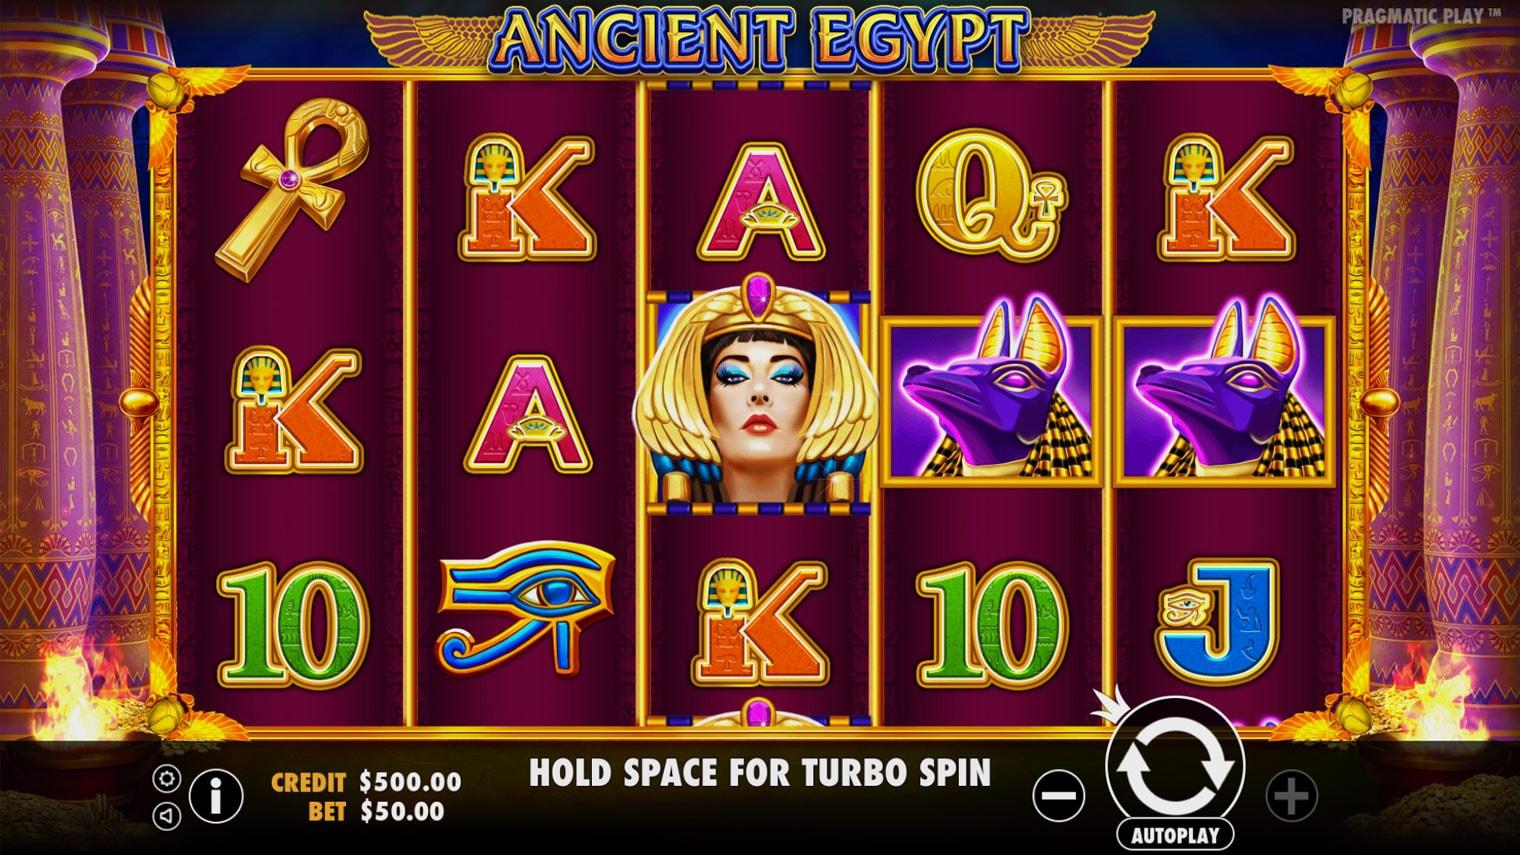 Slot Ancient Egypt Pragmatic Play